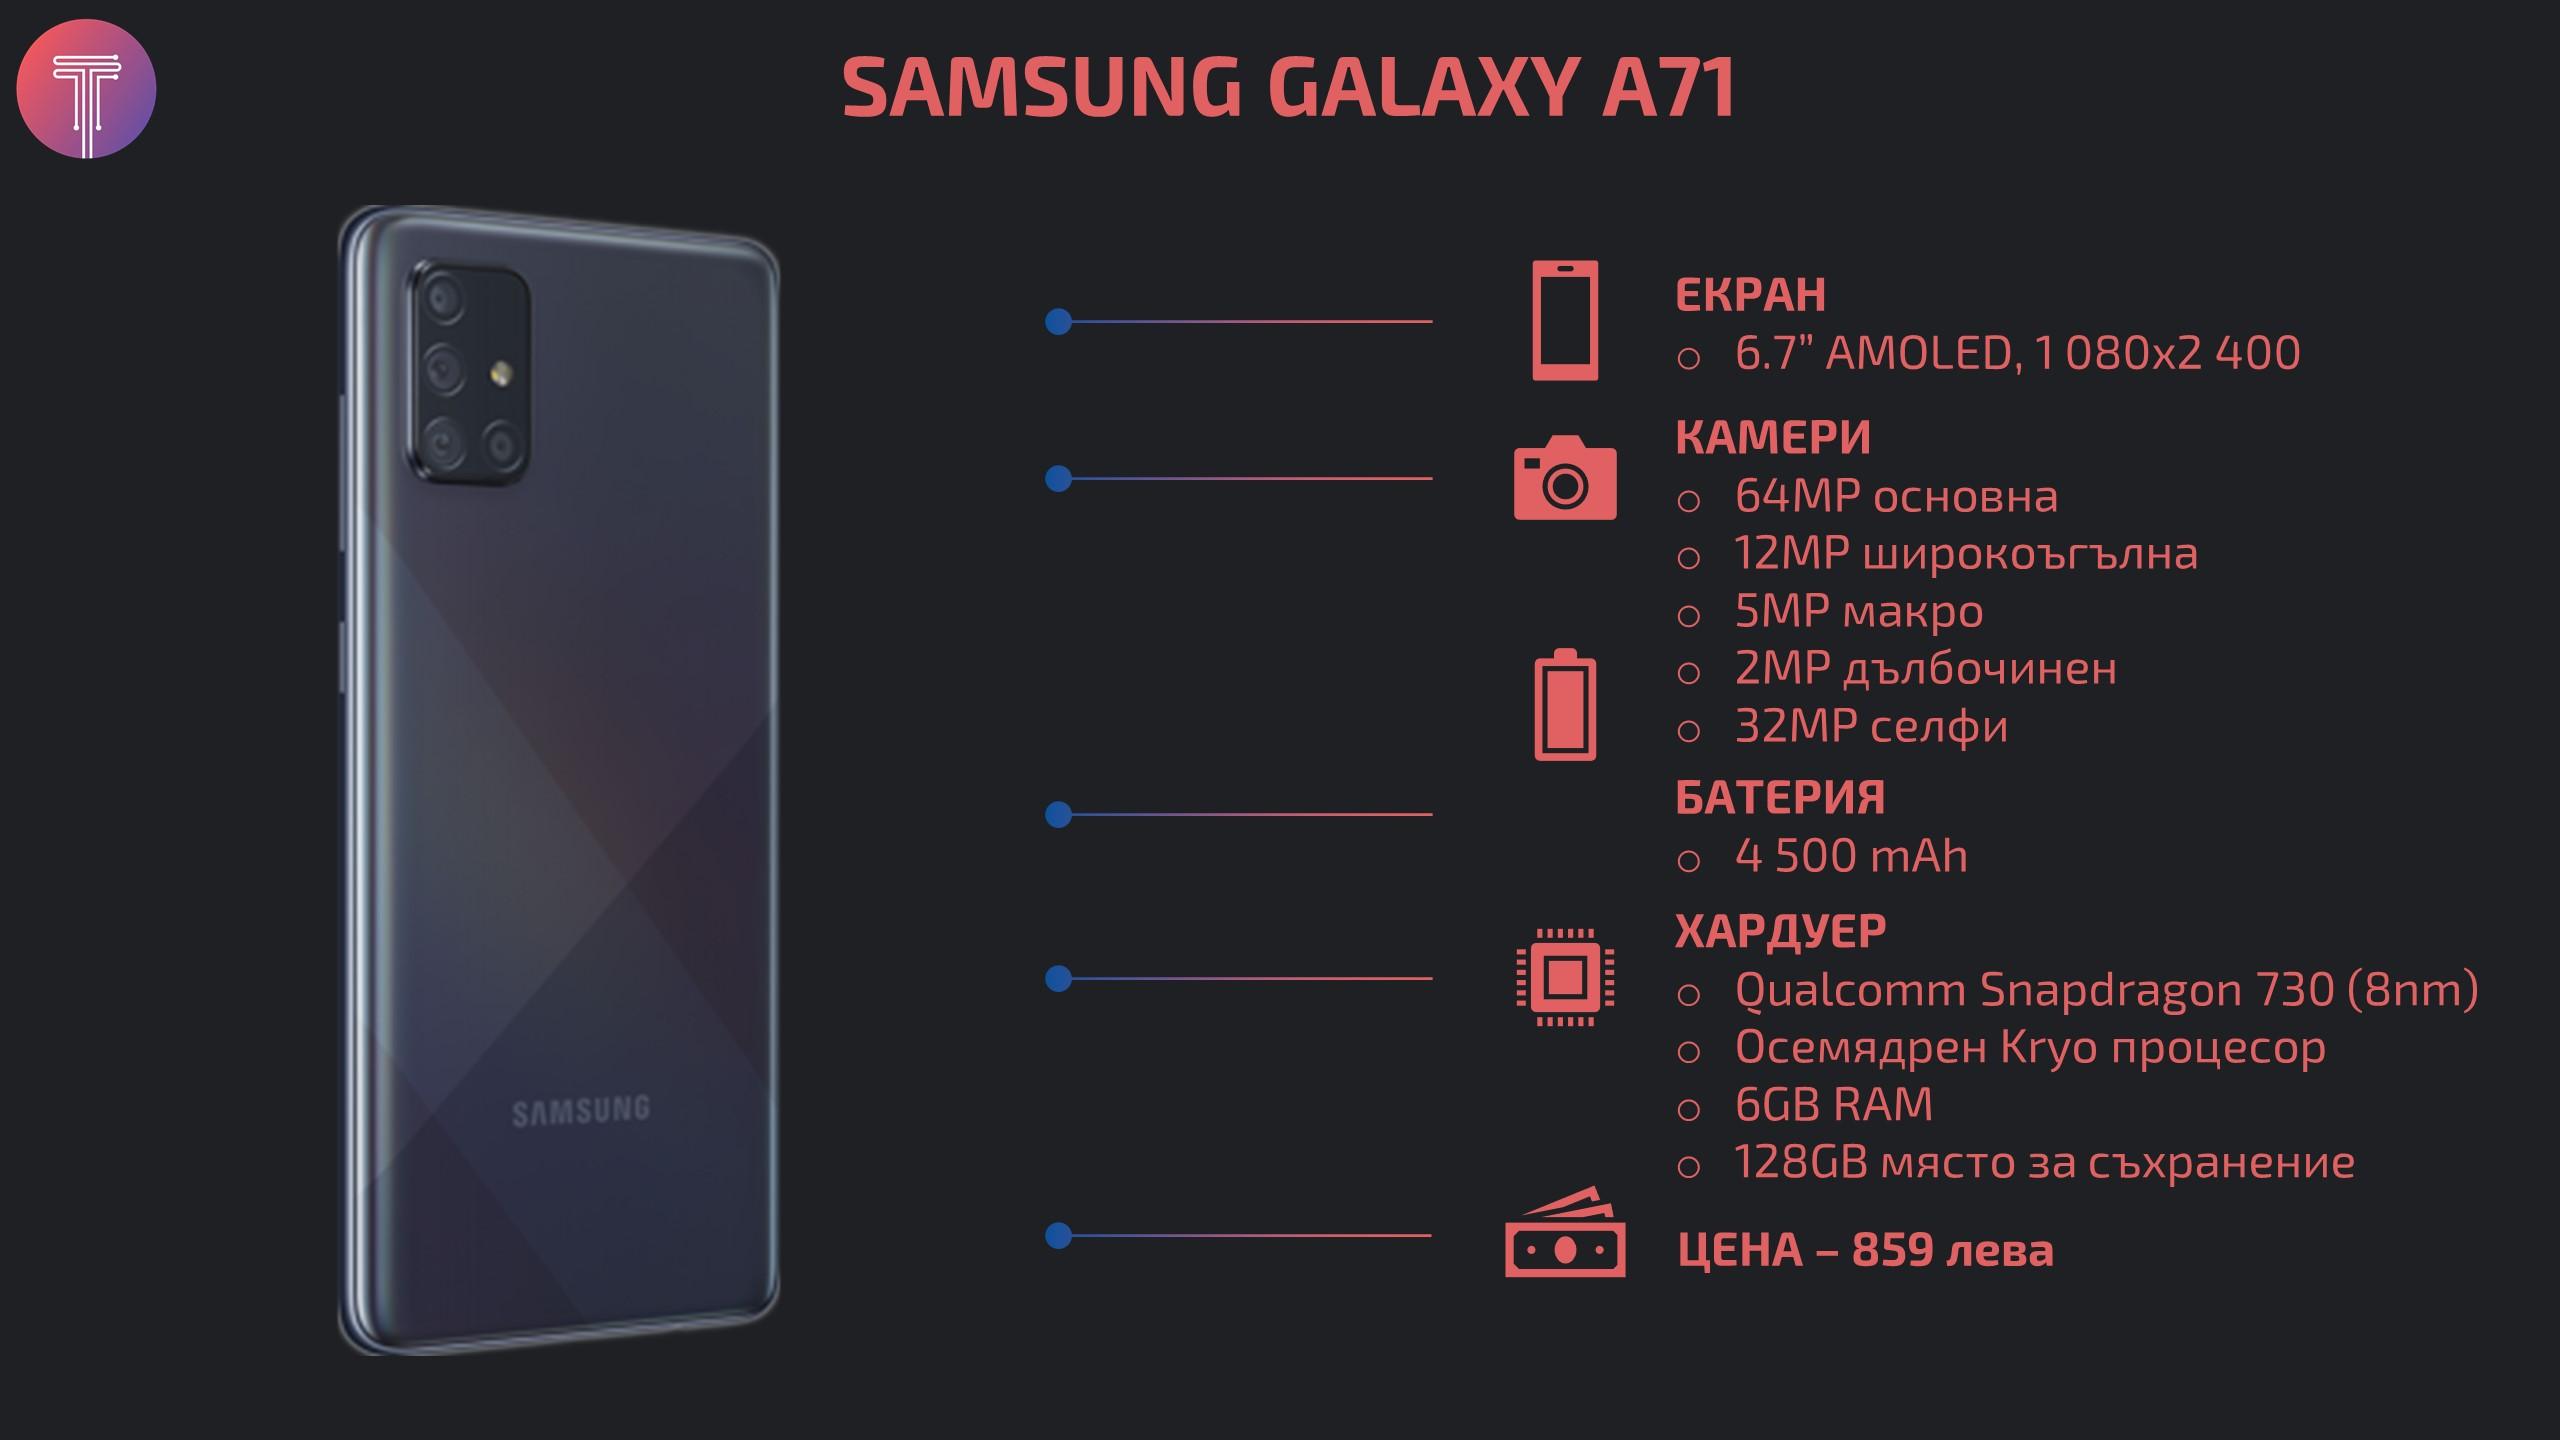 Samsung Galaxy A71 infographic